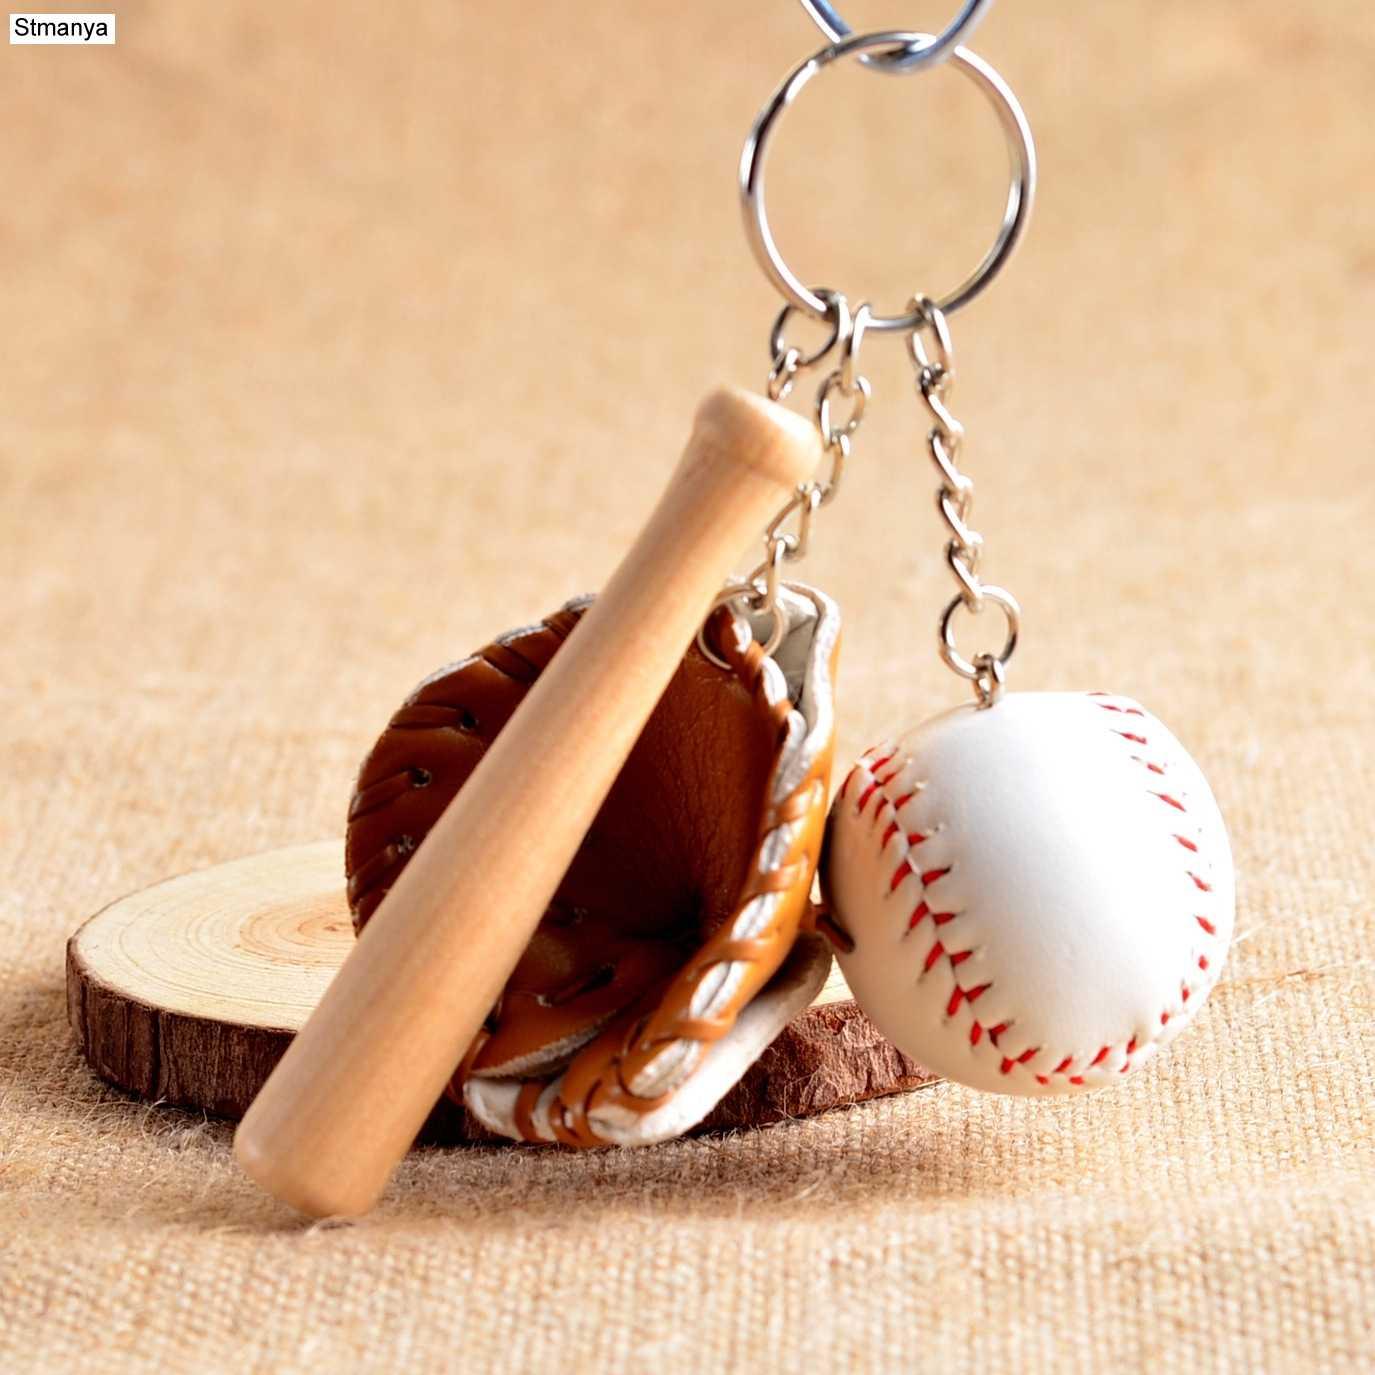 Mini Three-piece Baseball glove wooden bat keychain sports Car Key Chain  Key Ring Gift 1631903be